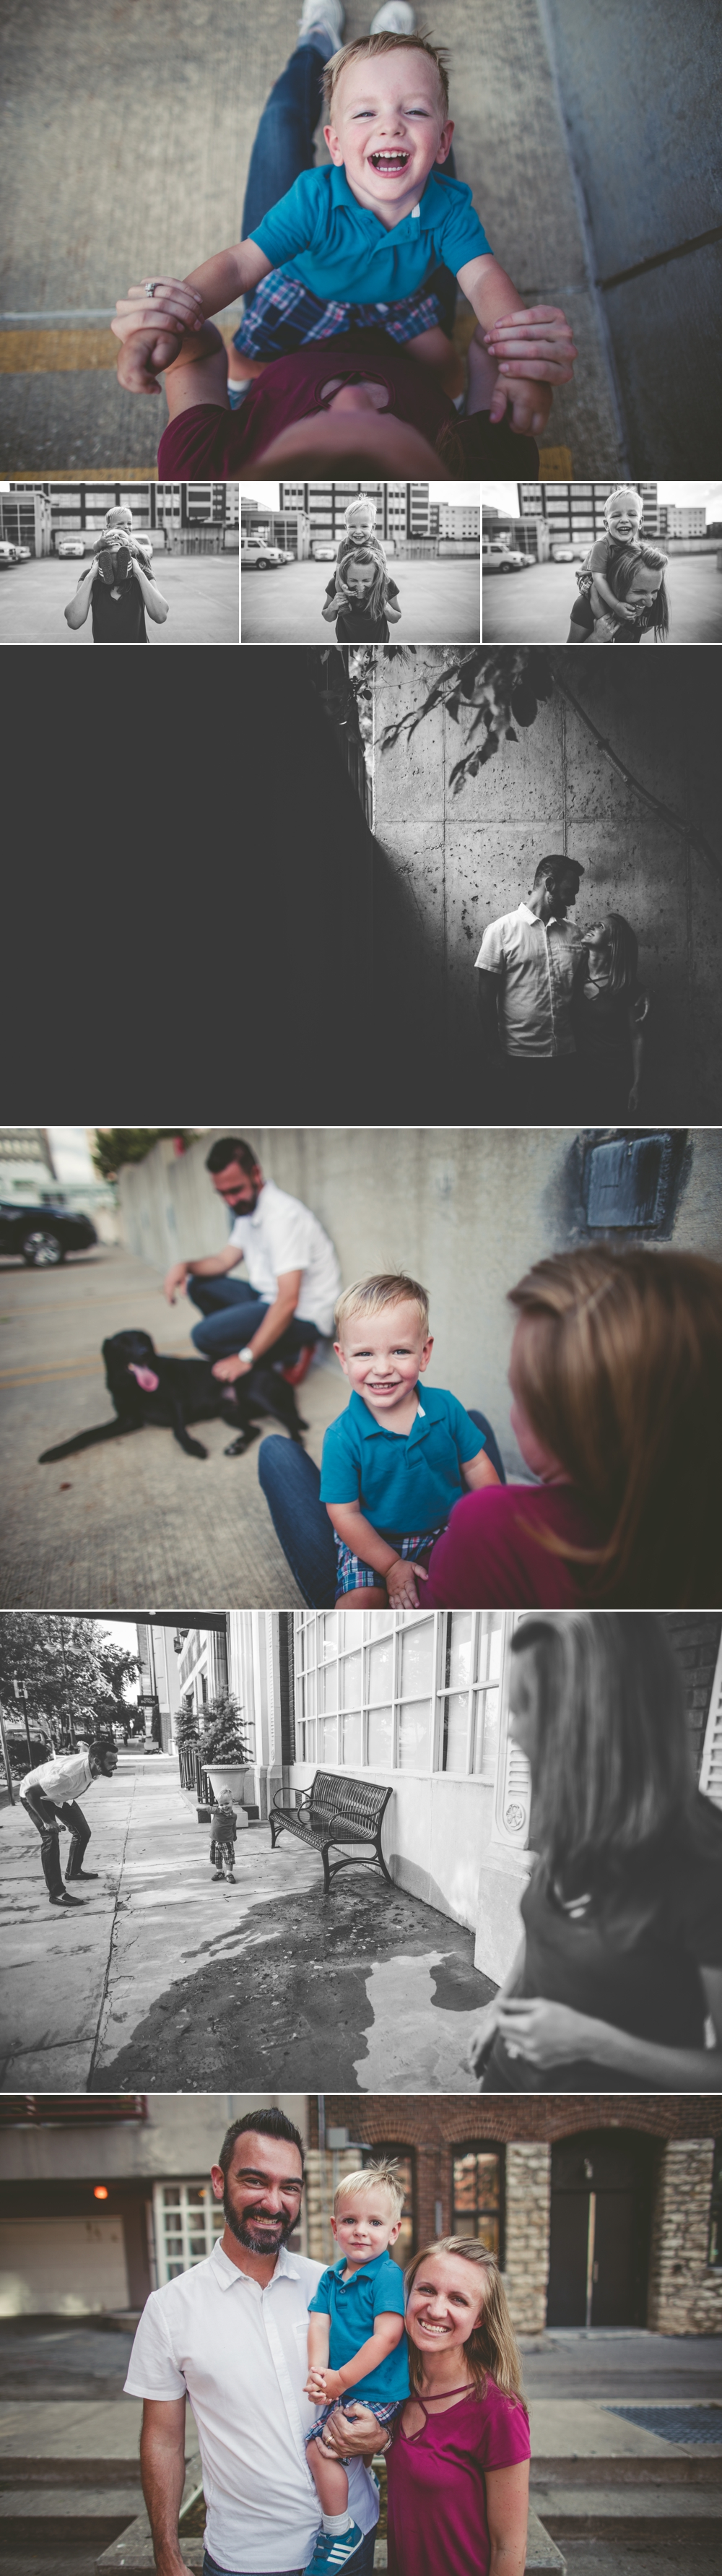 jason_domingues_photography_best_kansas_city_photographer_family_lifestyle_portraits_kc_0002